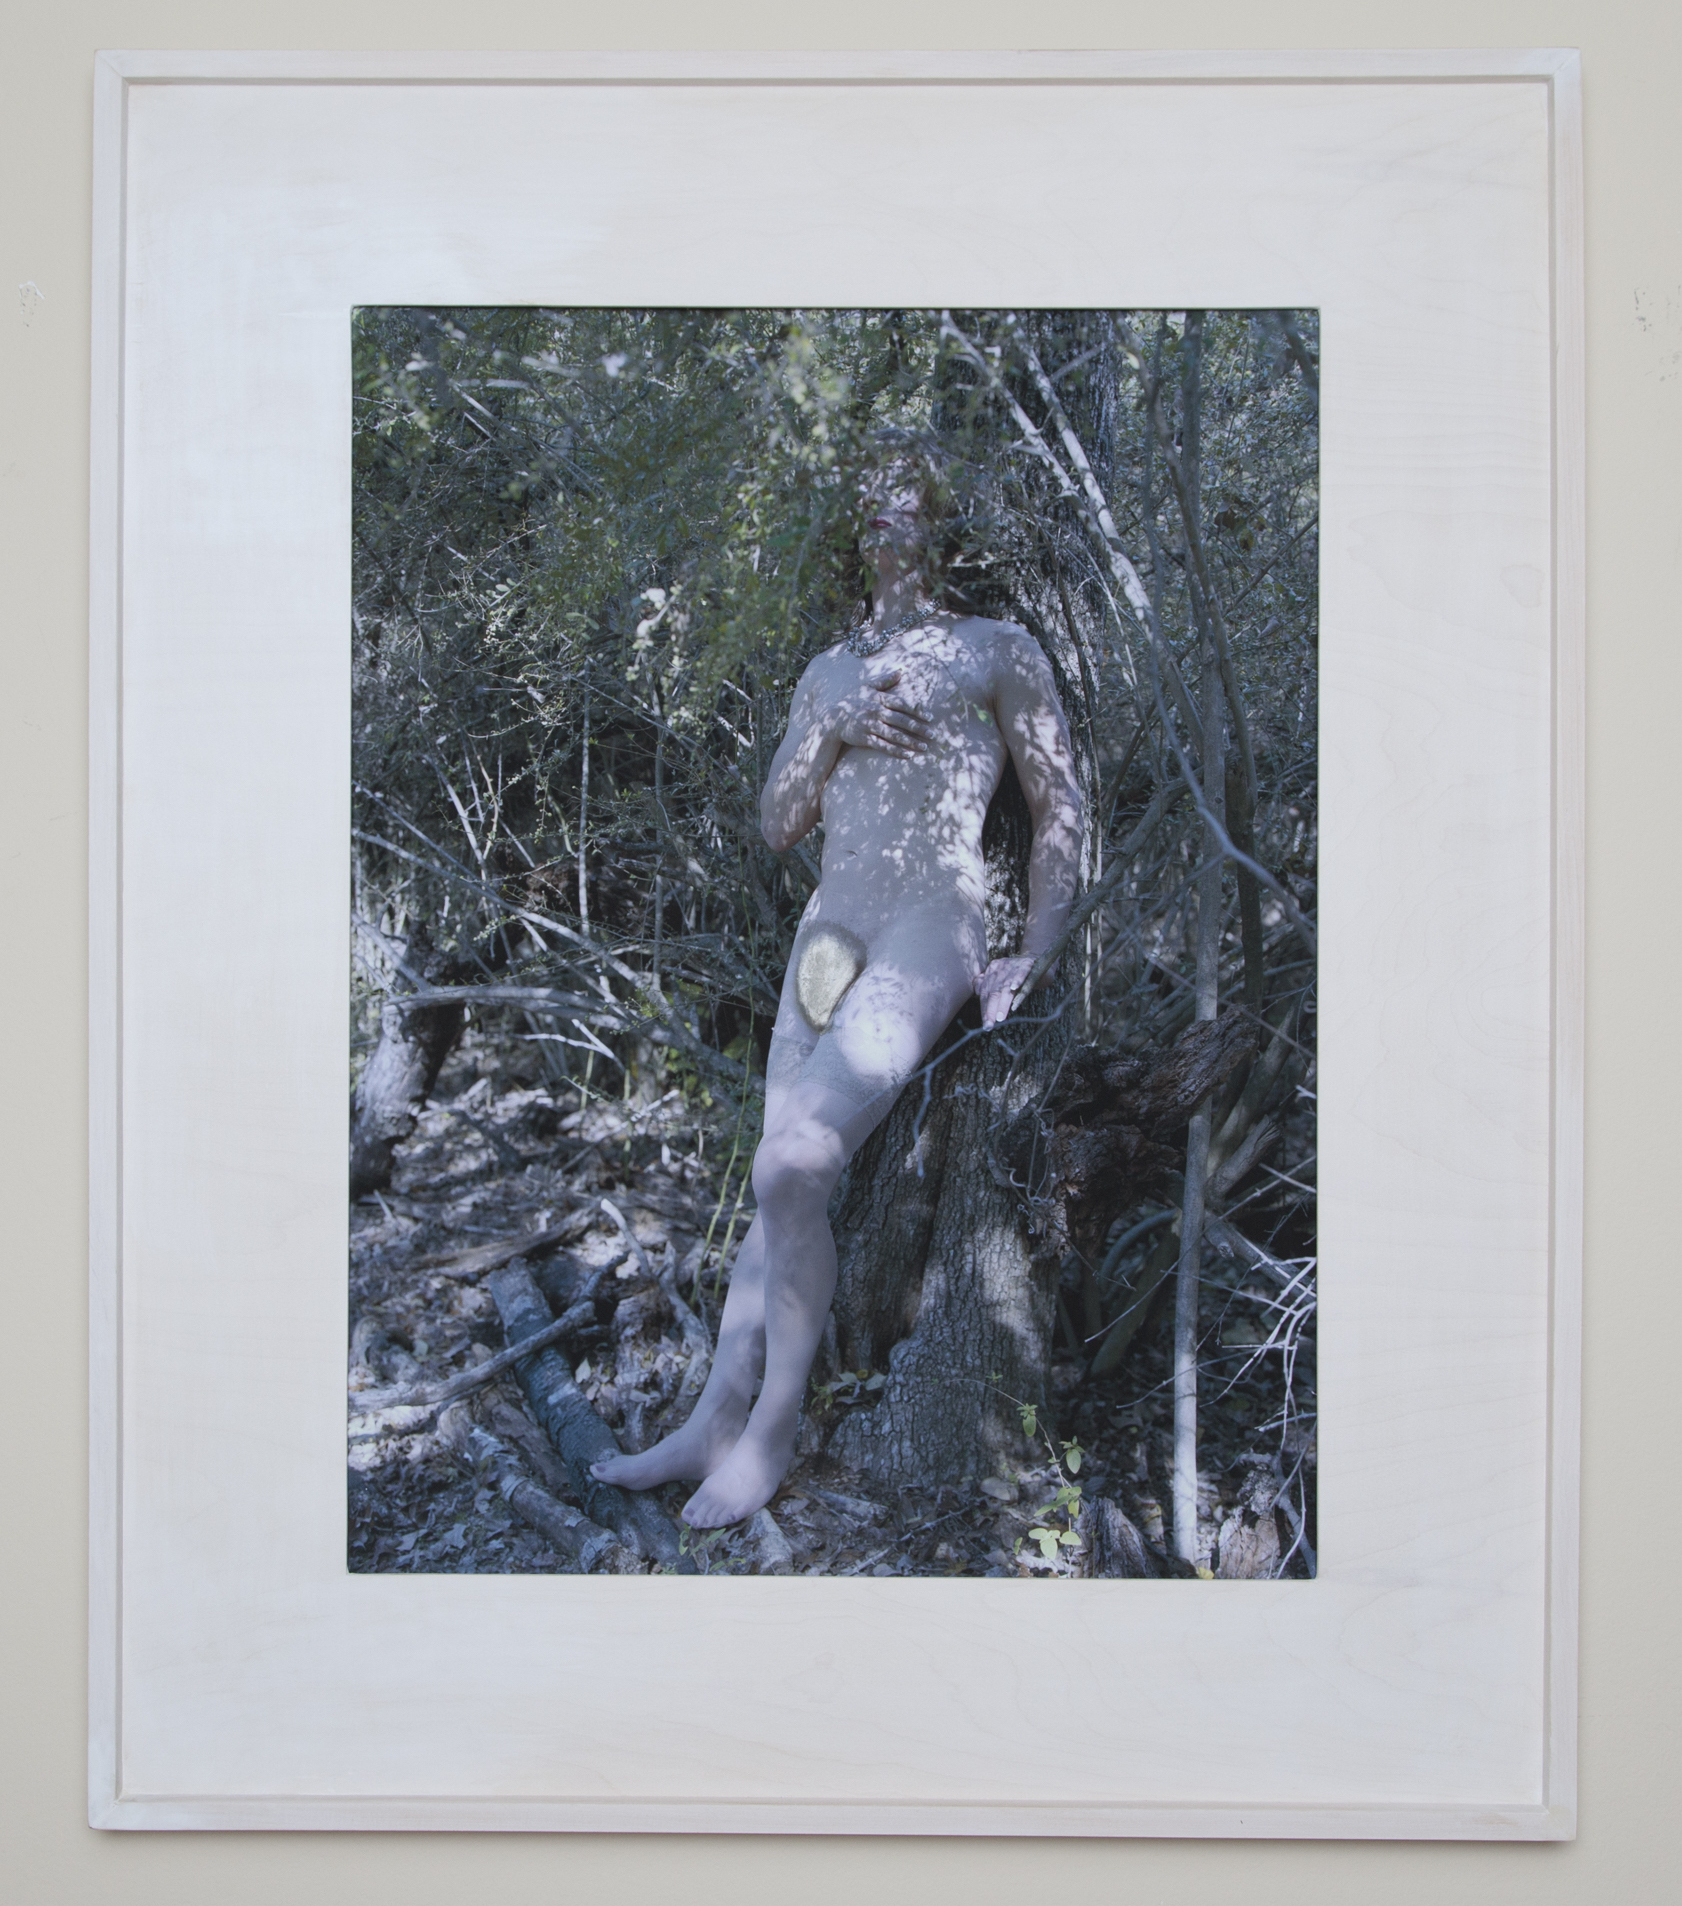 Bohus Blauhut ,unique distressed archival inkjet print in custom maple frame,48 x 40 inches, 2016